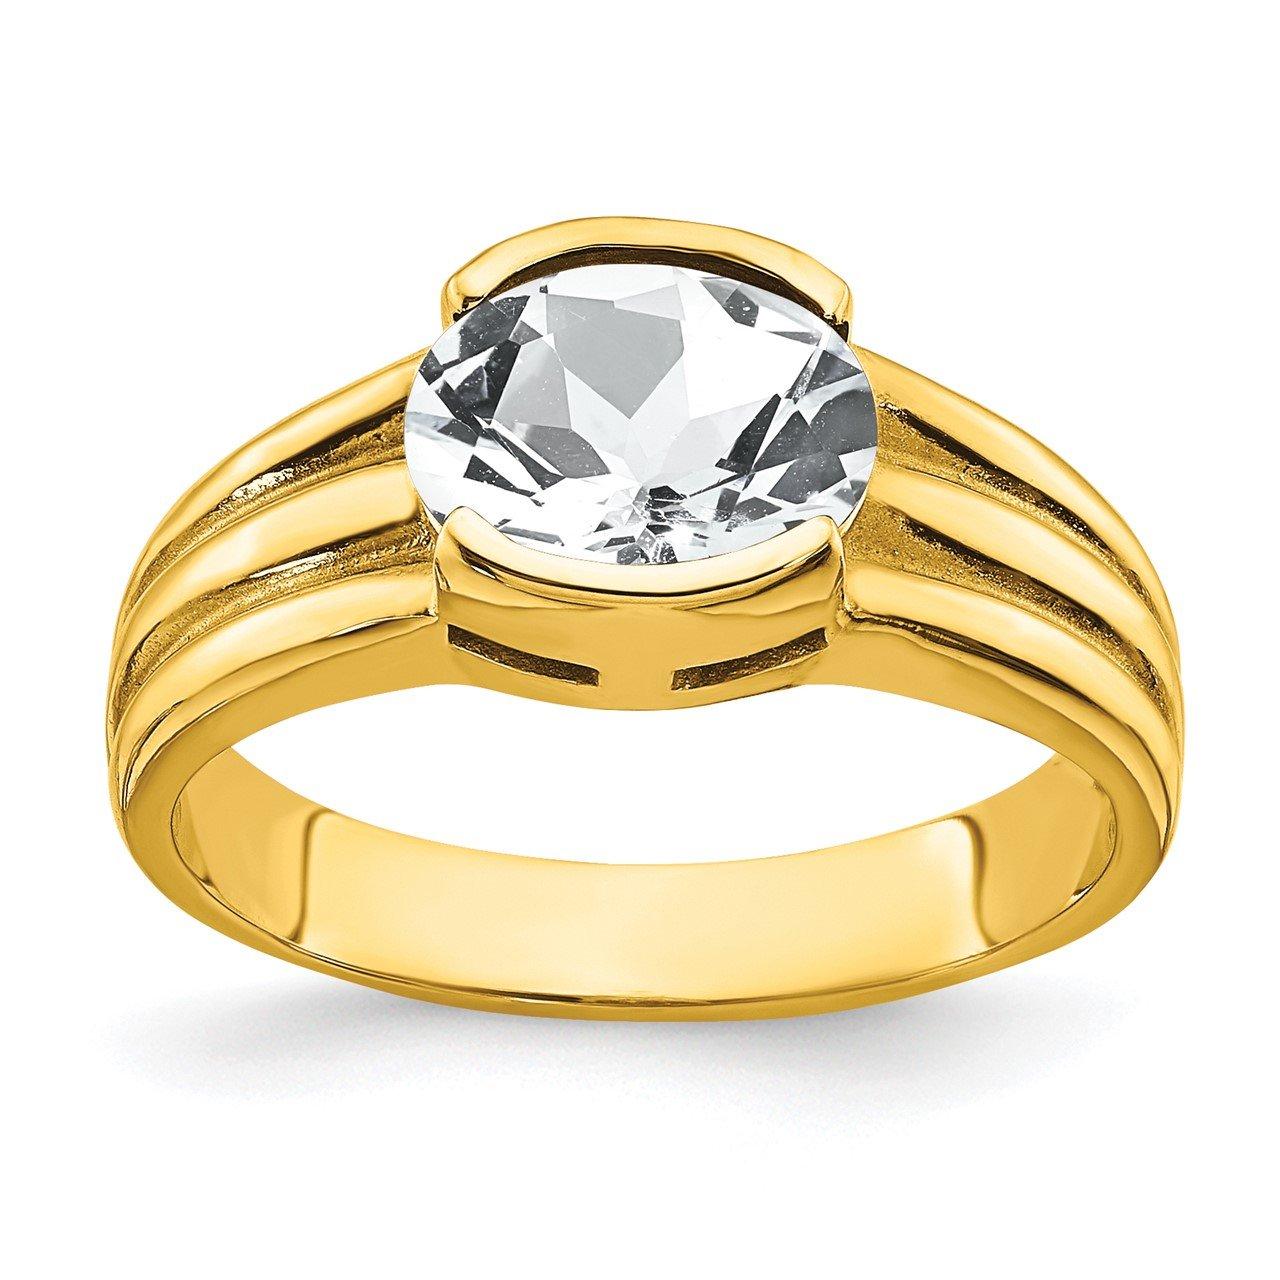 14k 8x6mm Oval Cubic Zirconia Ring